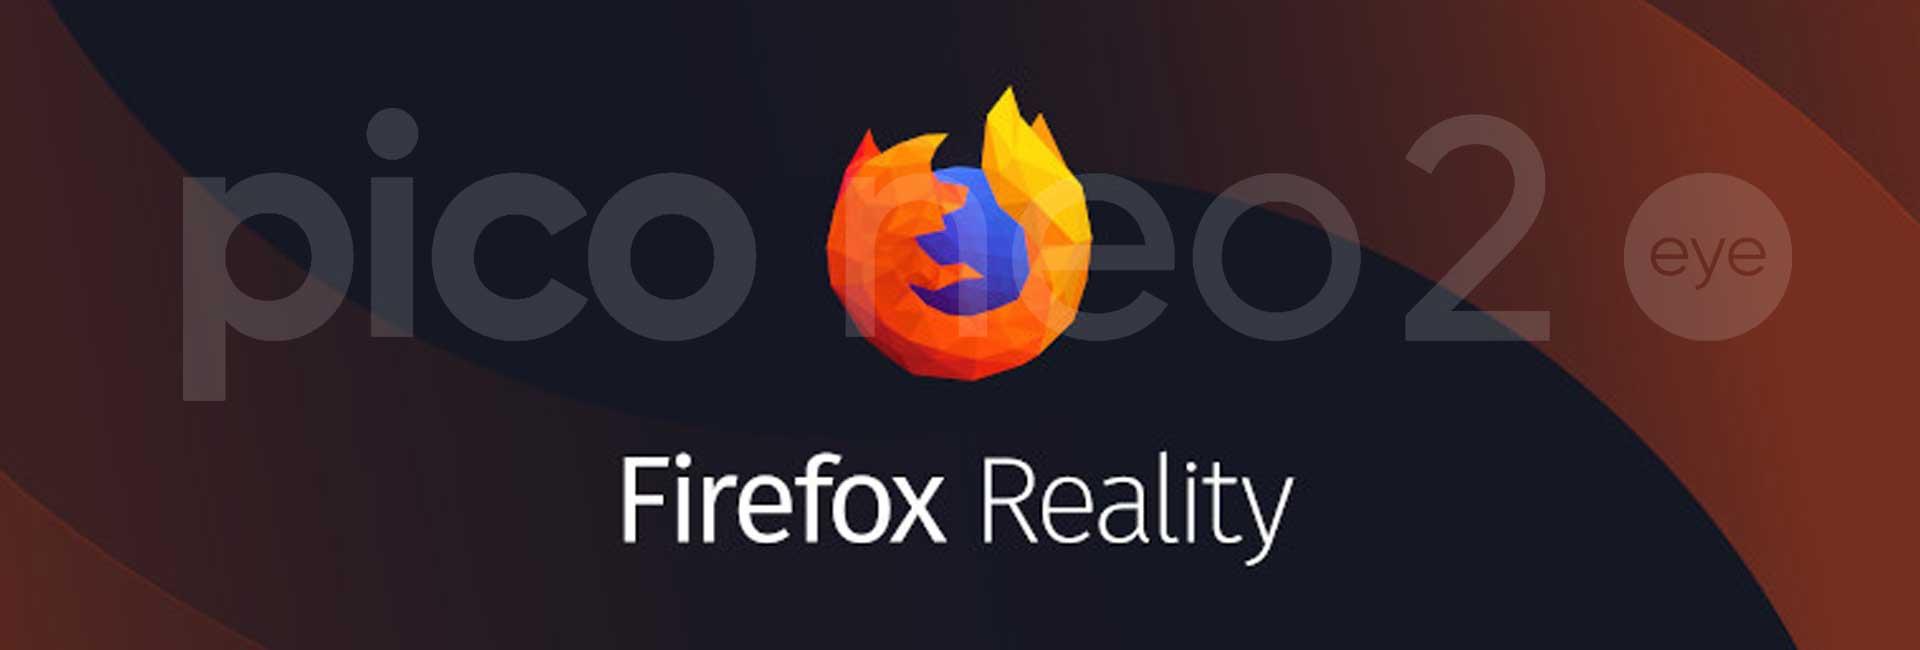 ff-reality-pico-2